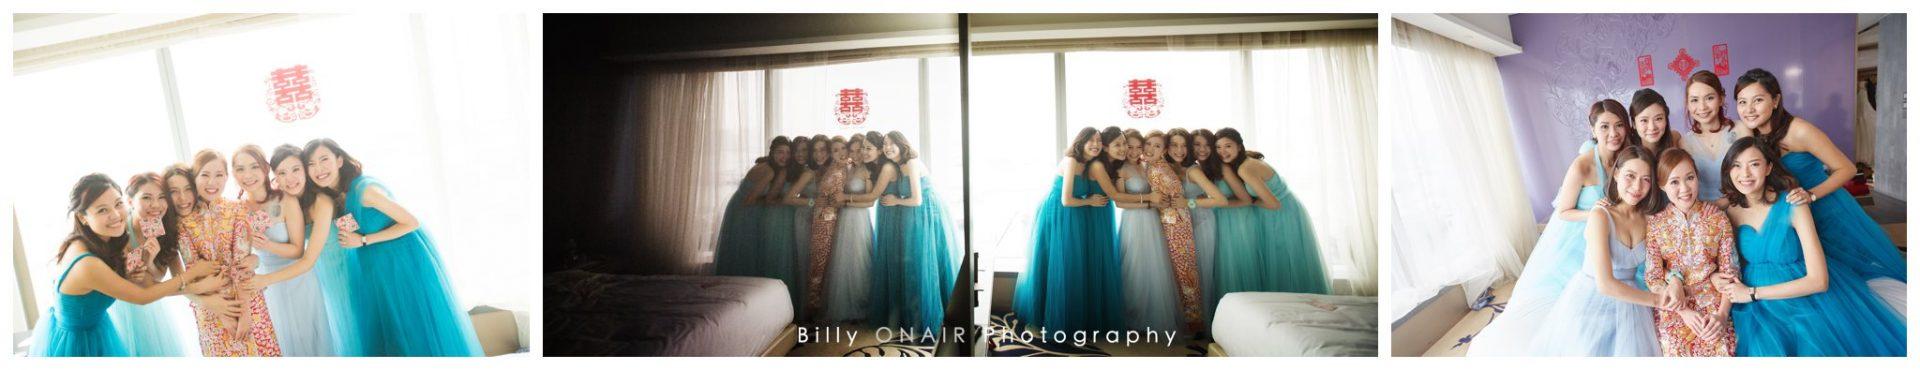 billy_wedding_photography_004